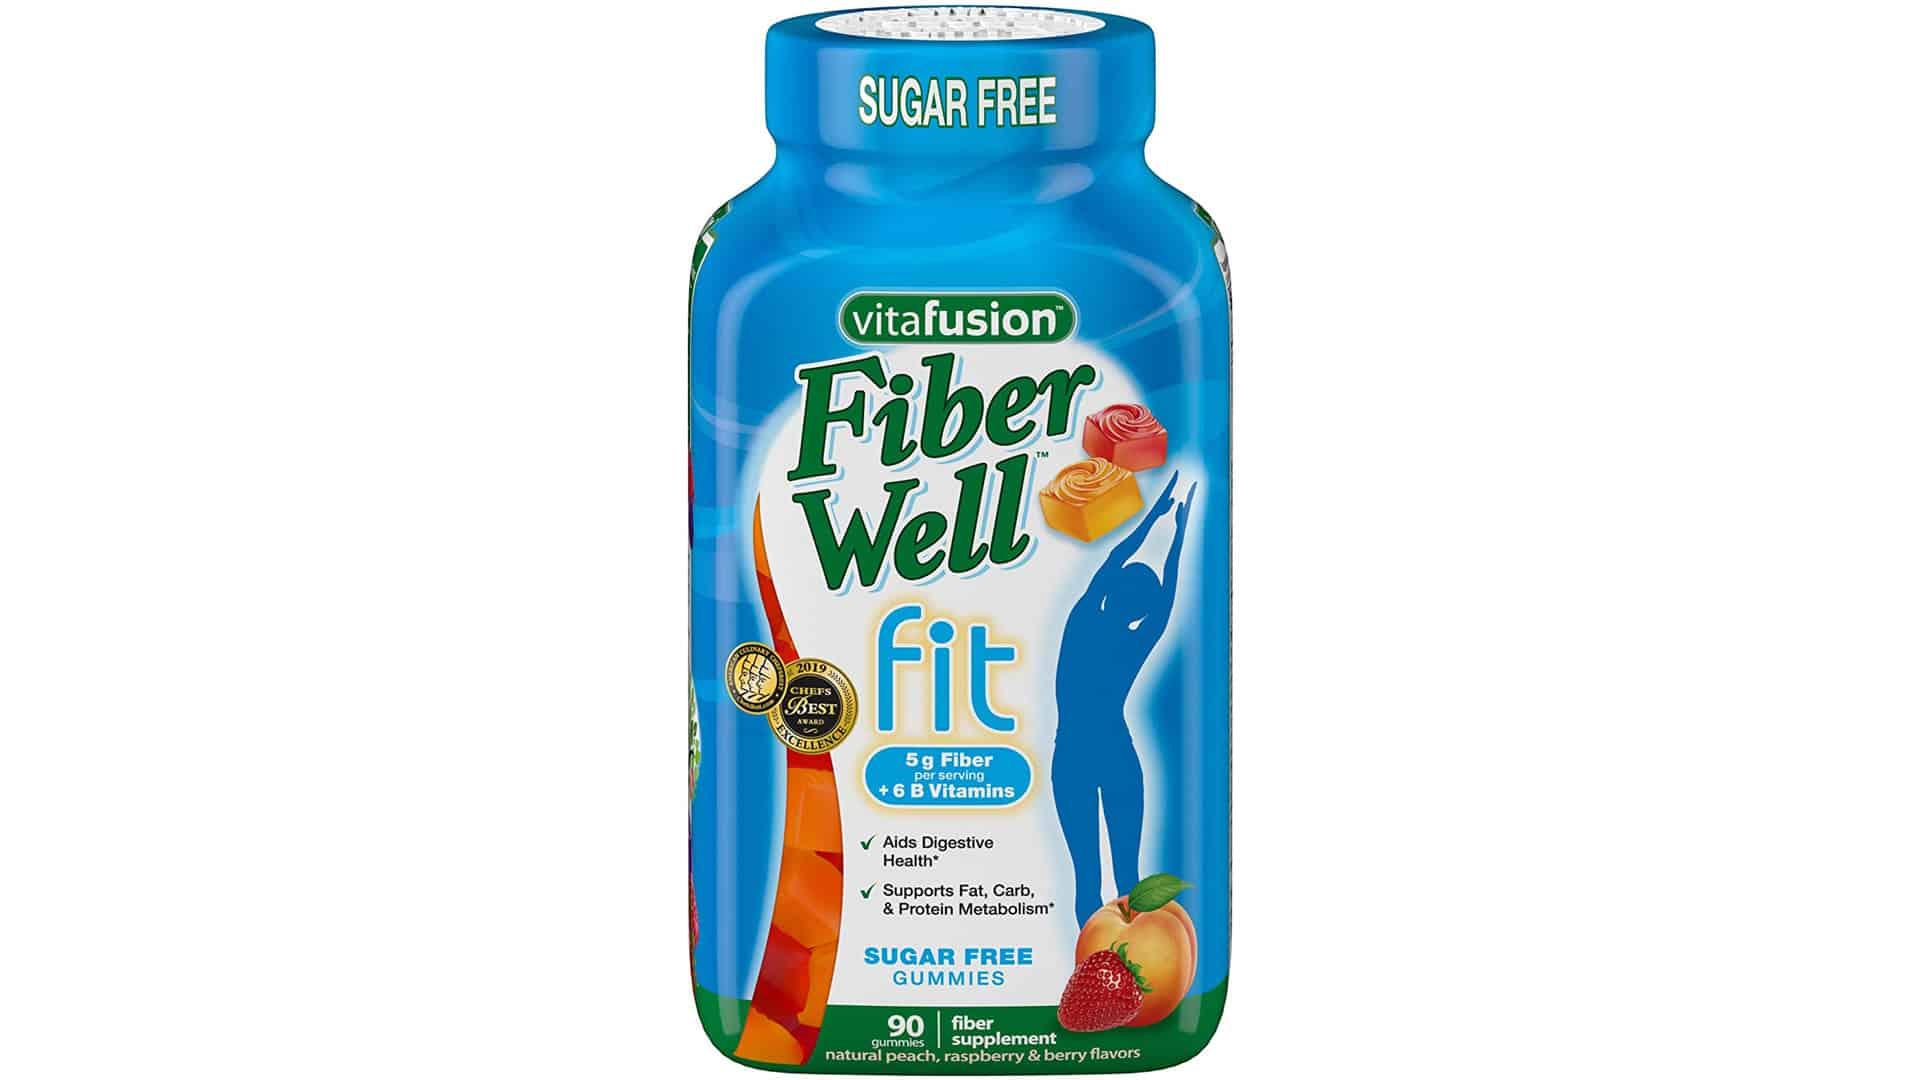 Vitafusion Fiber Well Fit Gummies Supplement